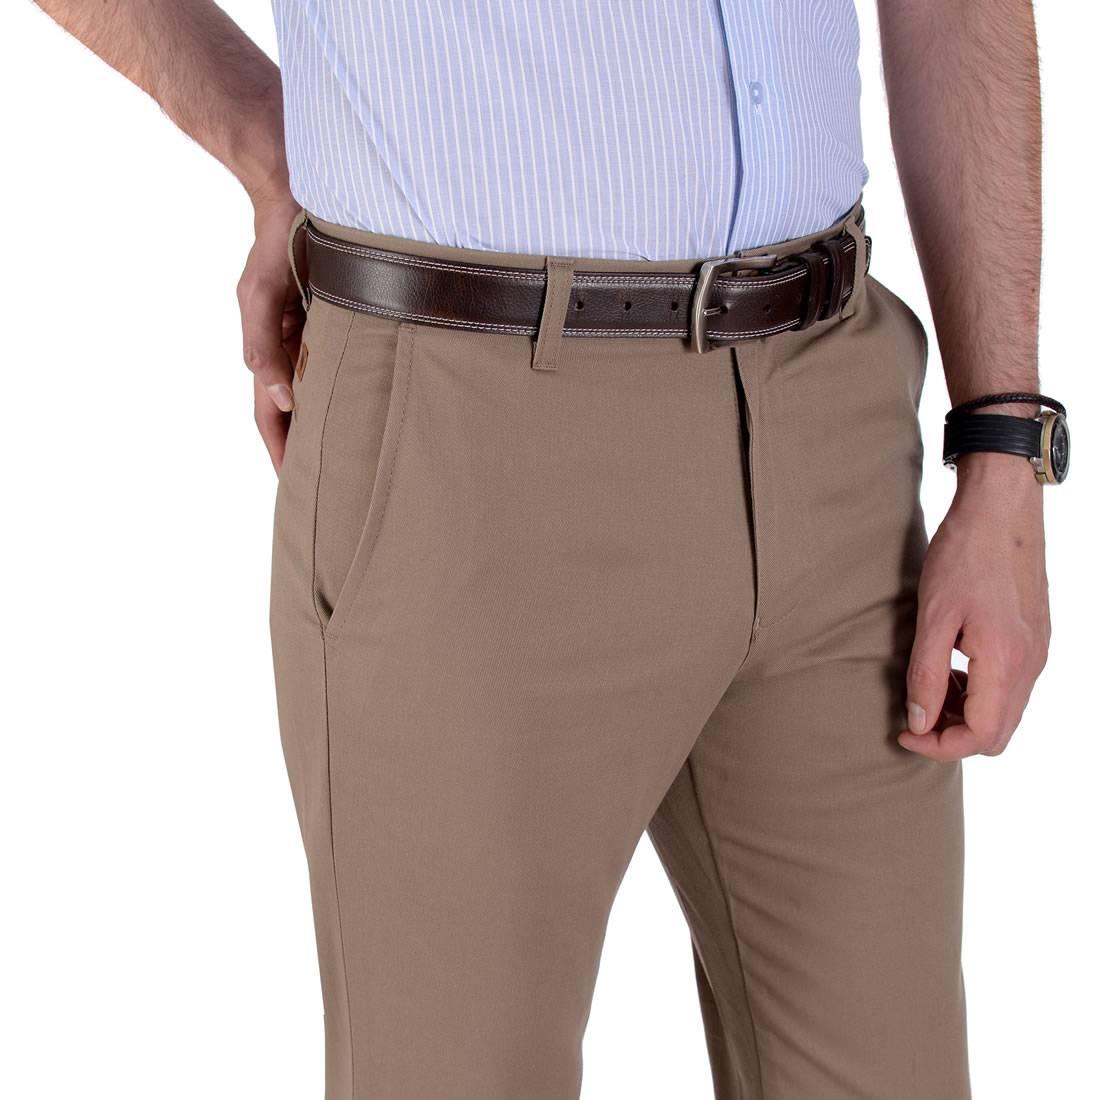 010789055268-03-Pantalon-Casual-Classic-Fit-Cafe-yale